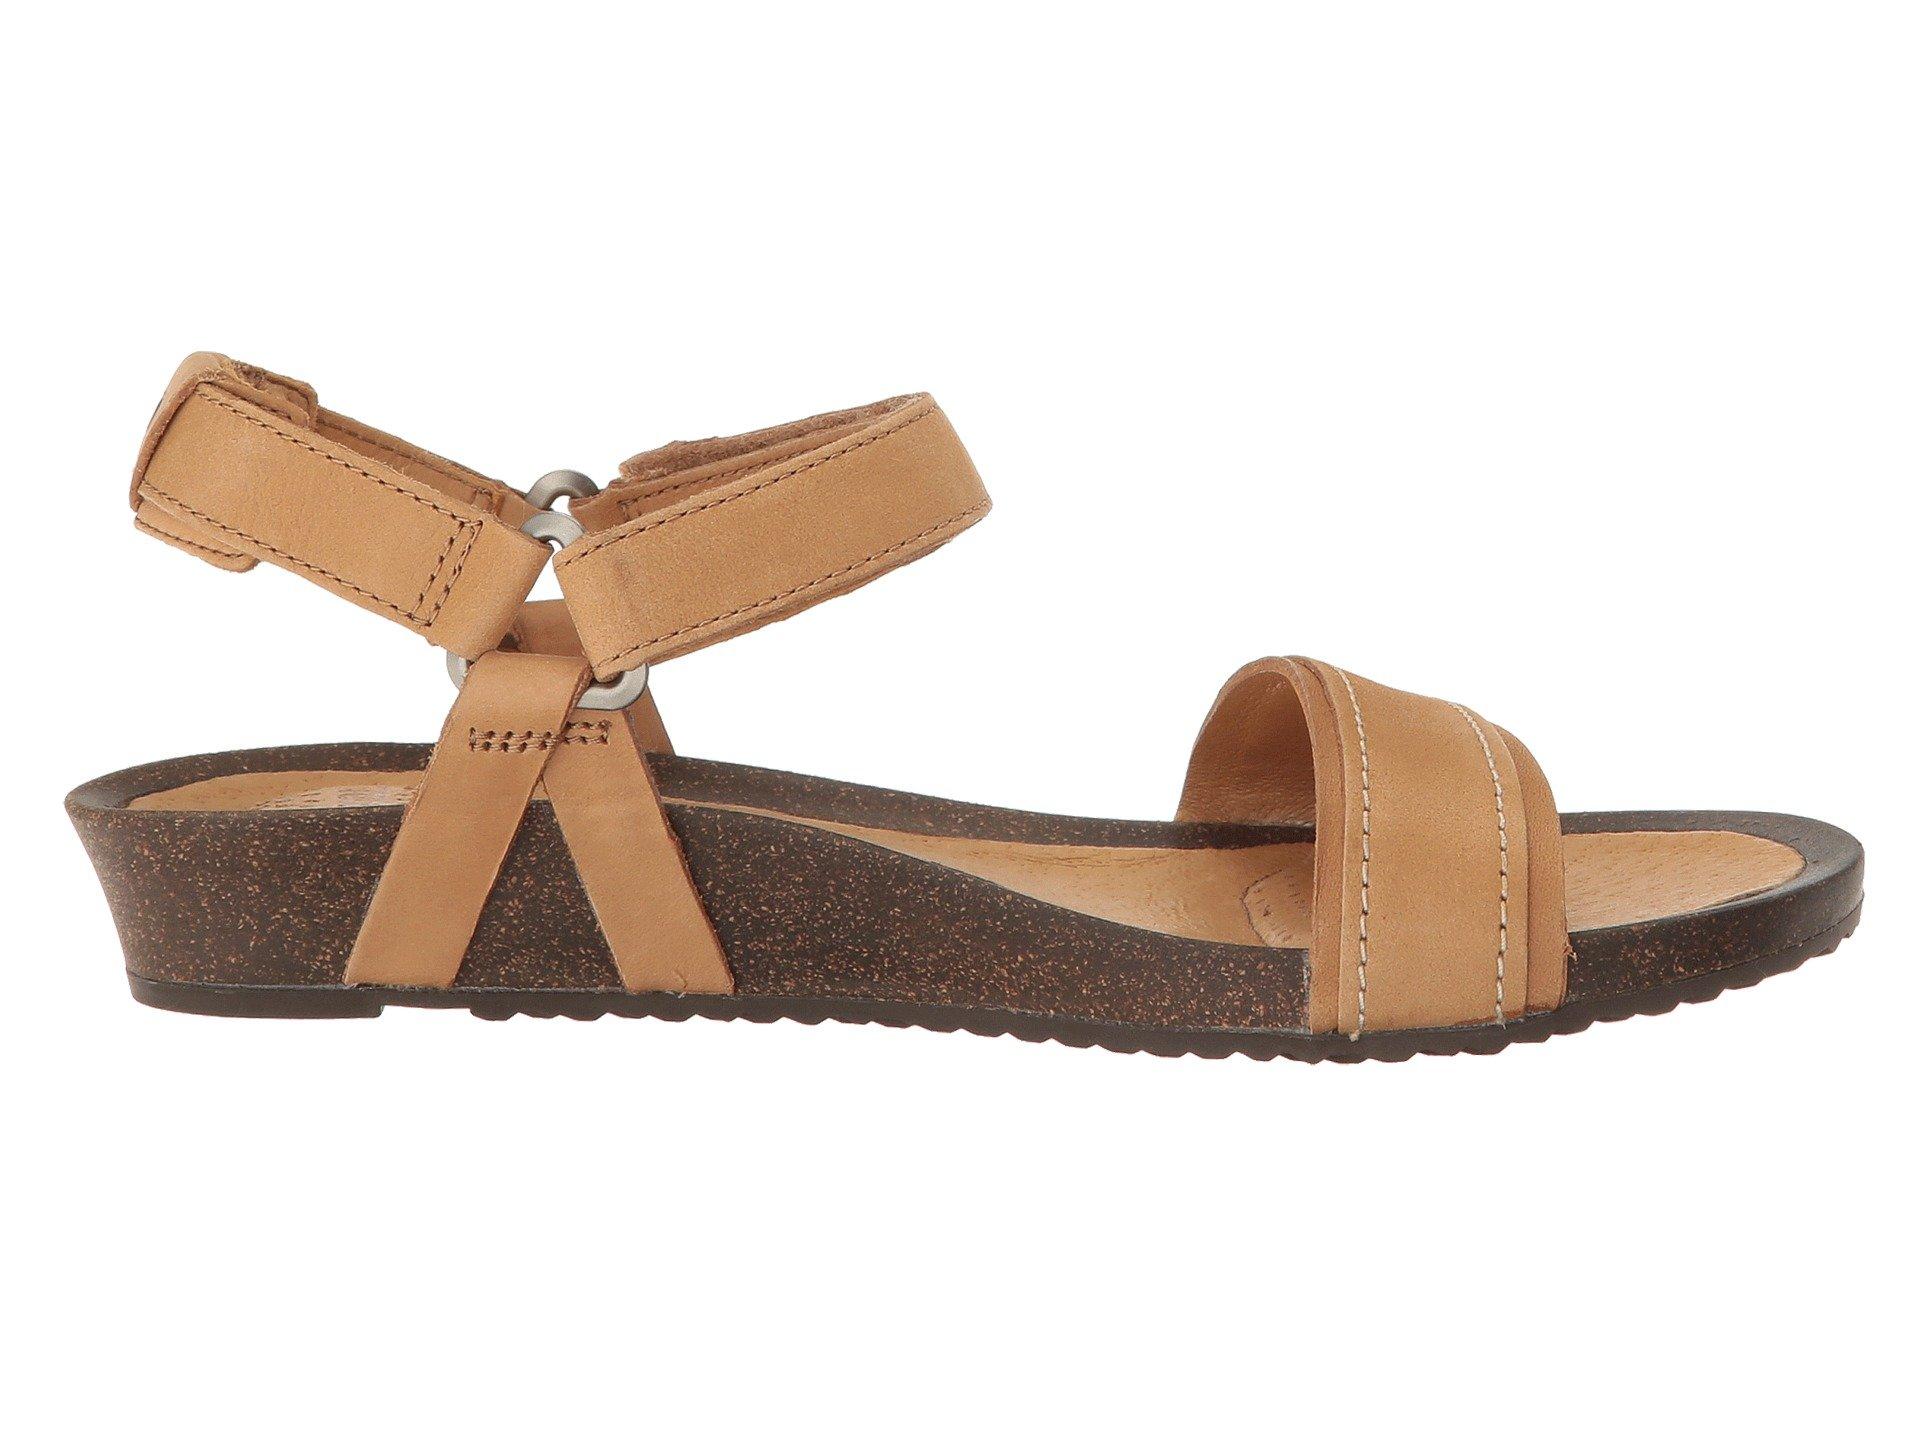 Teva Ysidro Stitch Sandal At Zappos Com